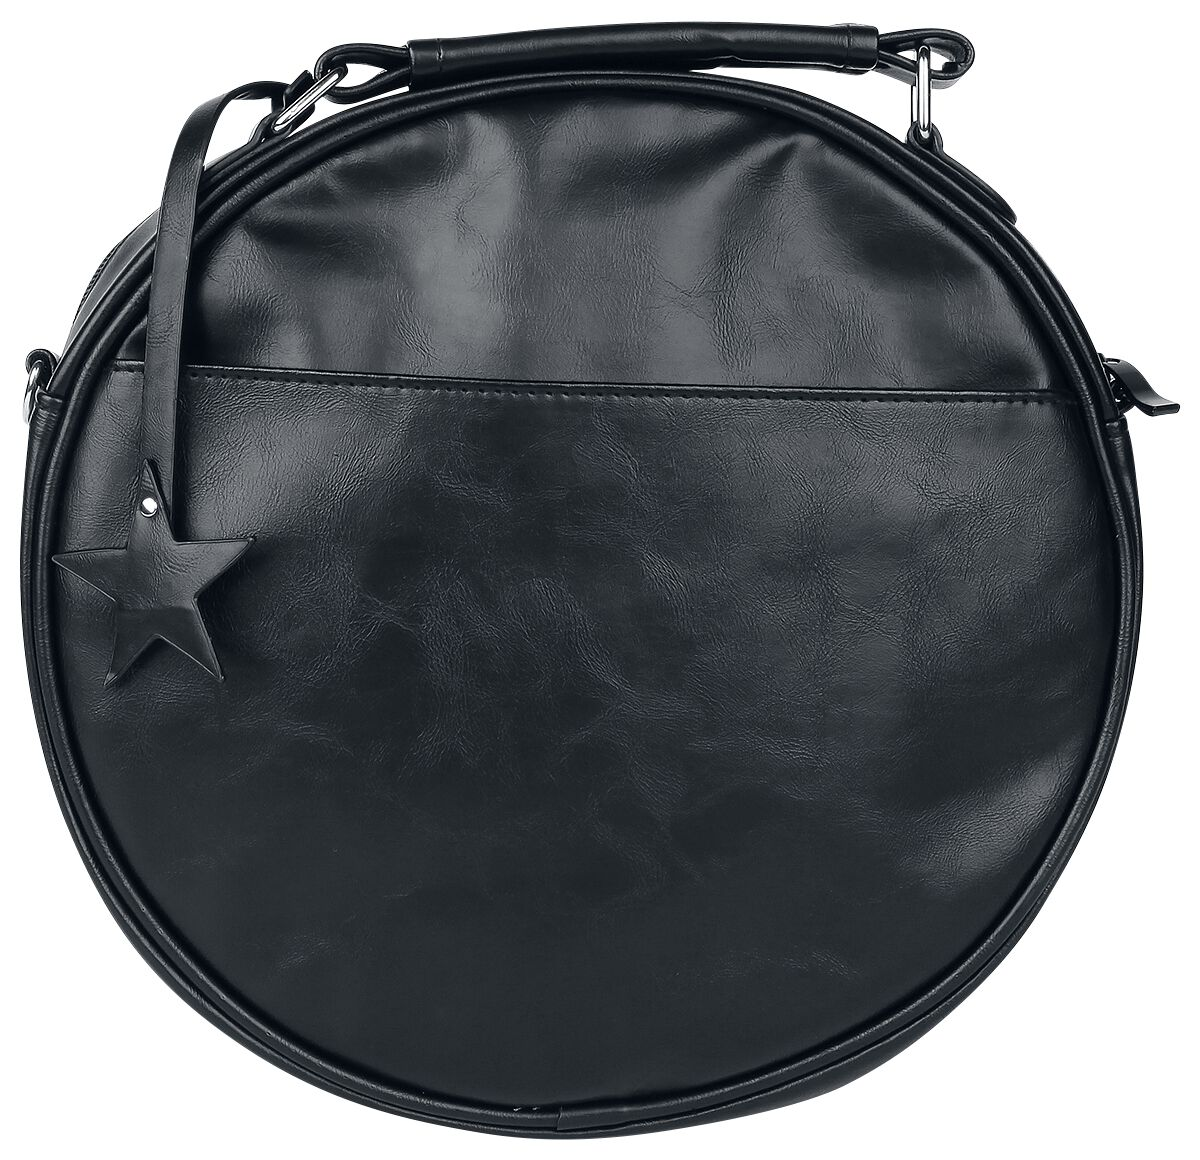 Osta Käsilaukku : Osta big pentagram k?silaukku netist?